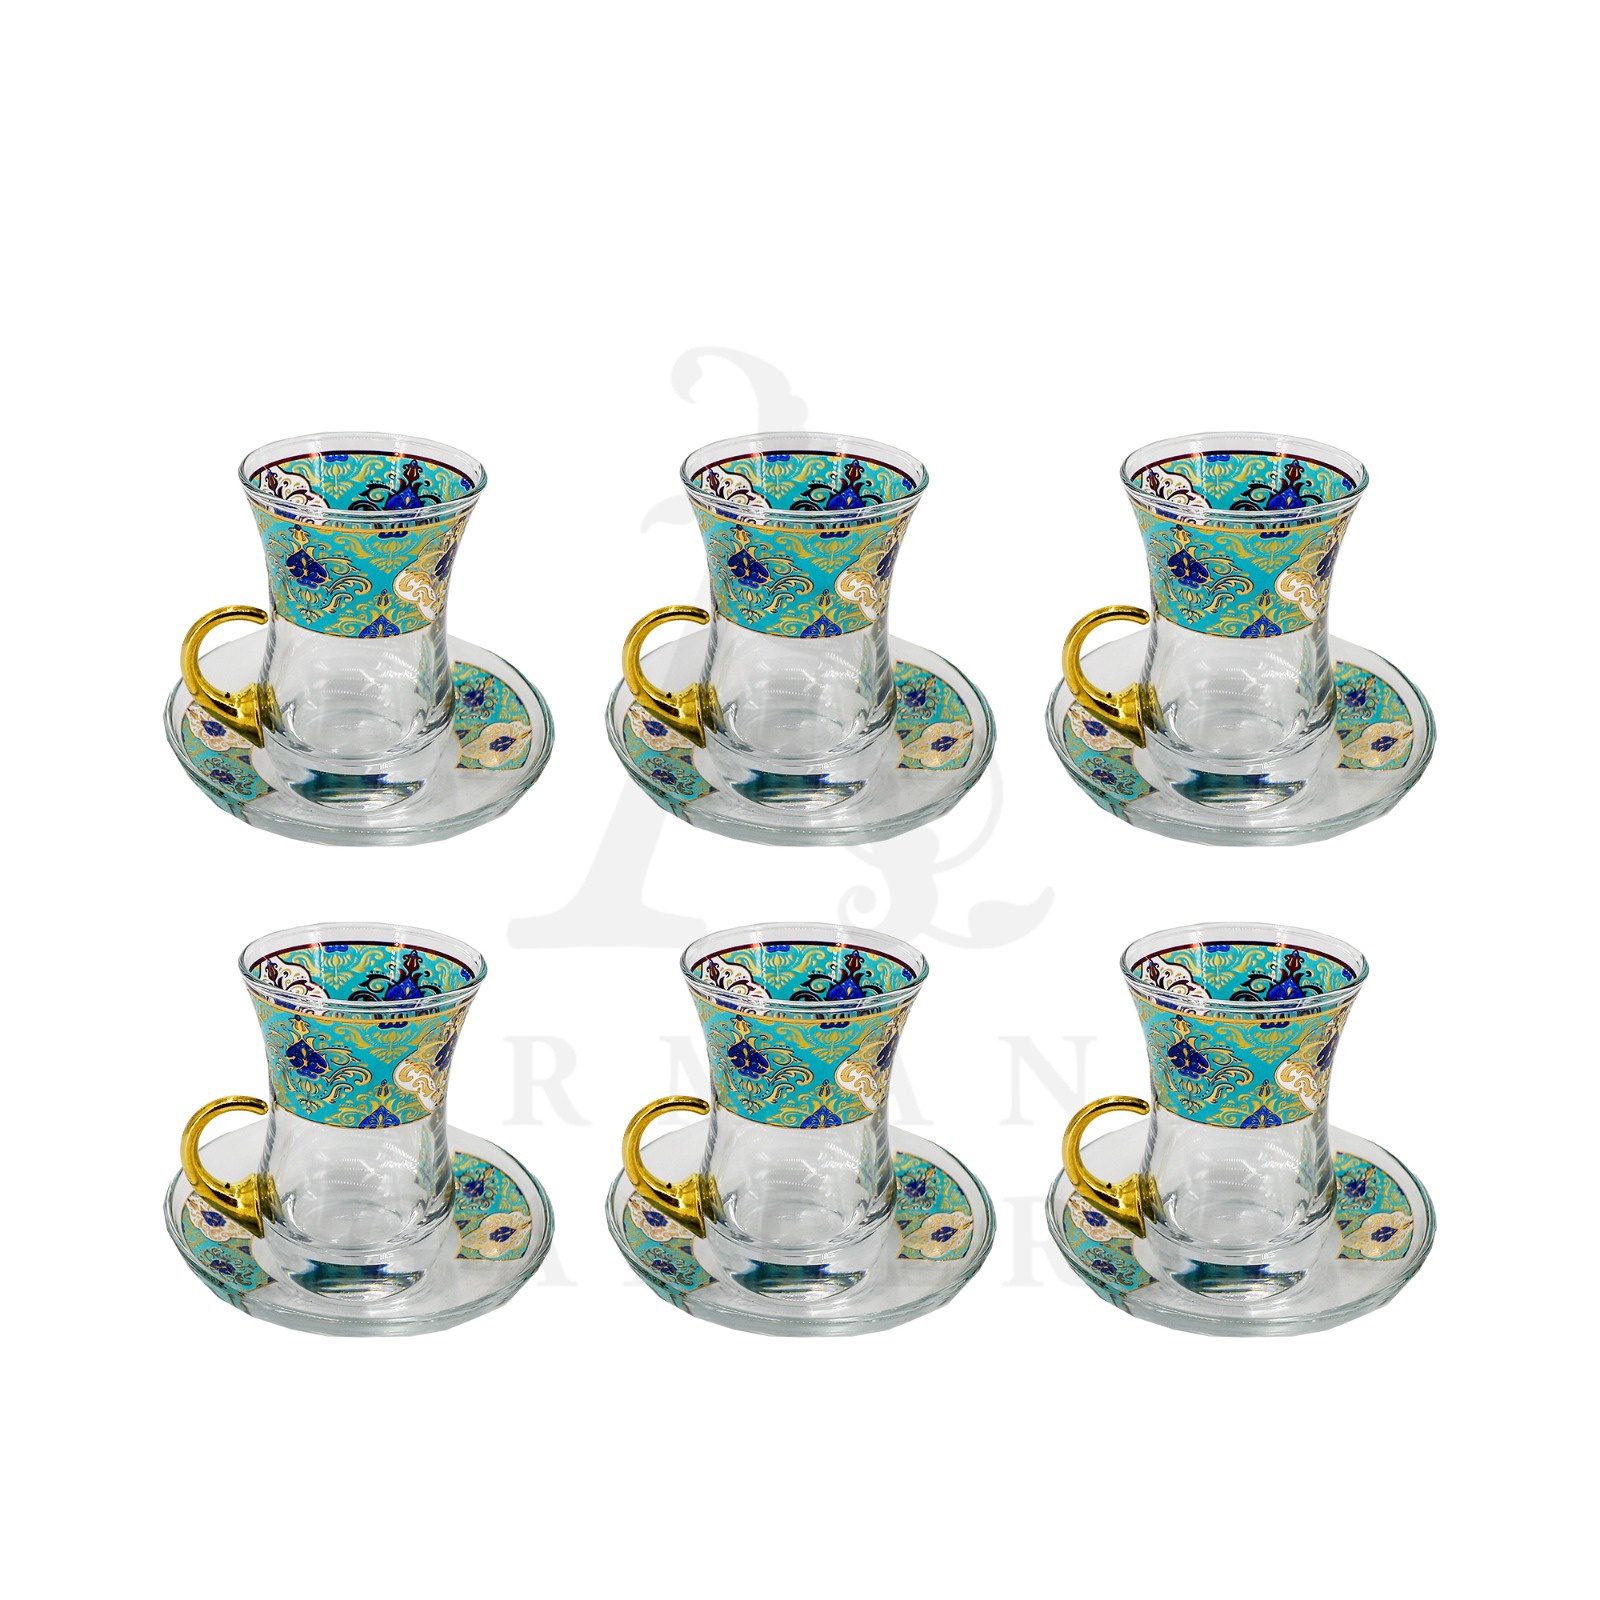 Buy Tea Glass Gold Handle Set with Glass Saucer - Light Blue